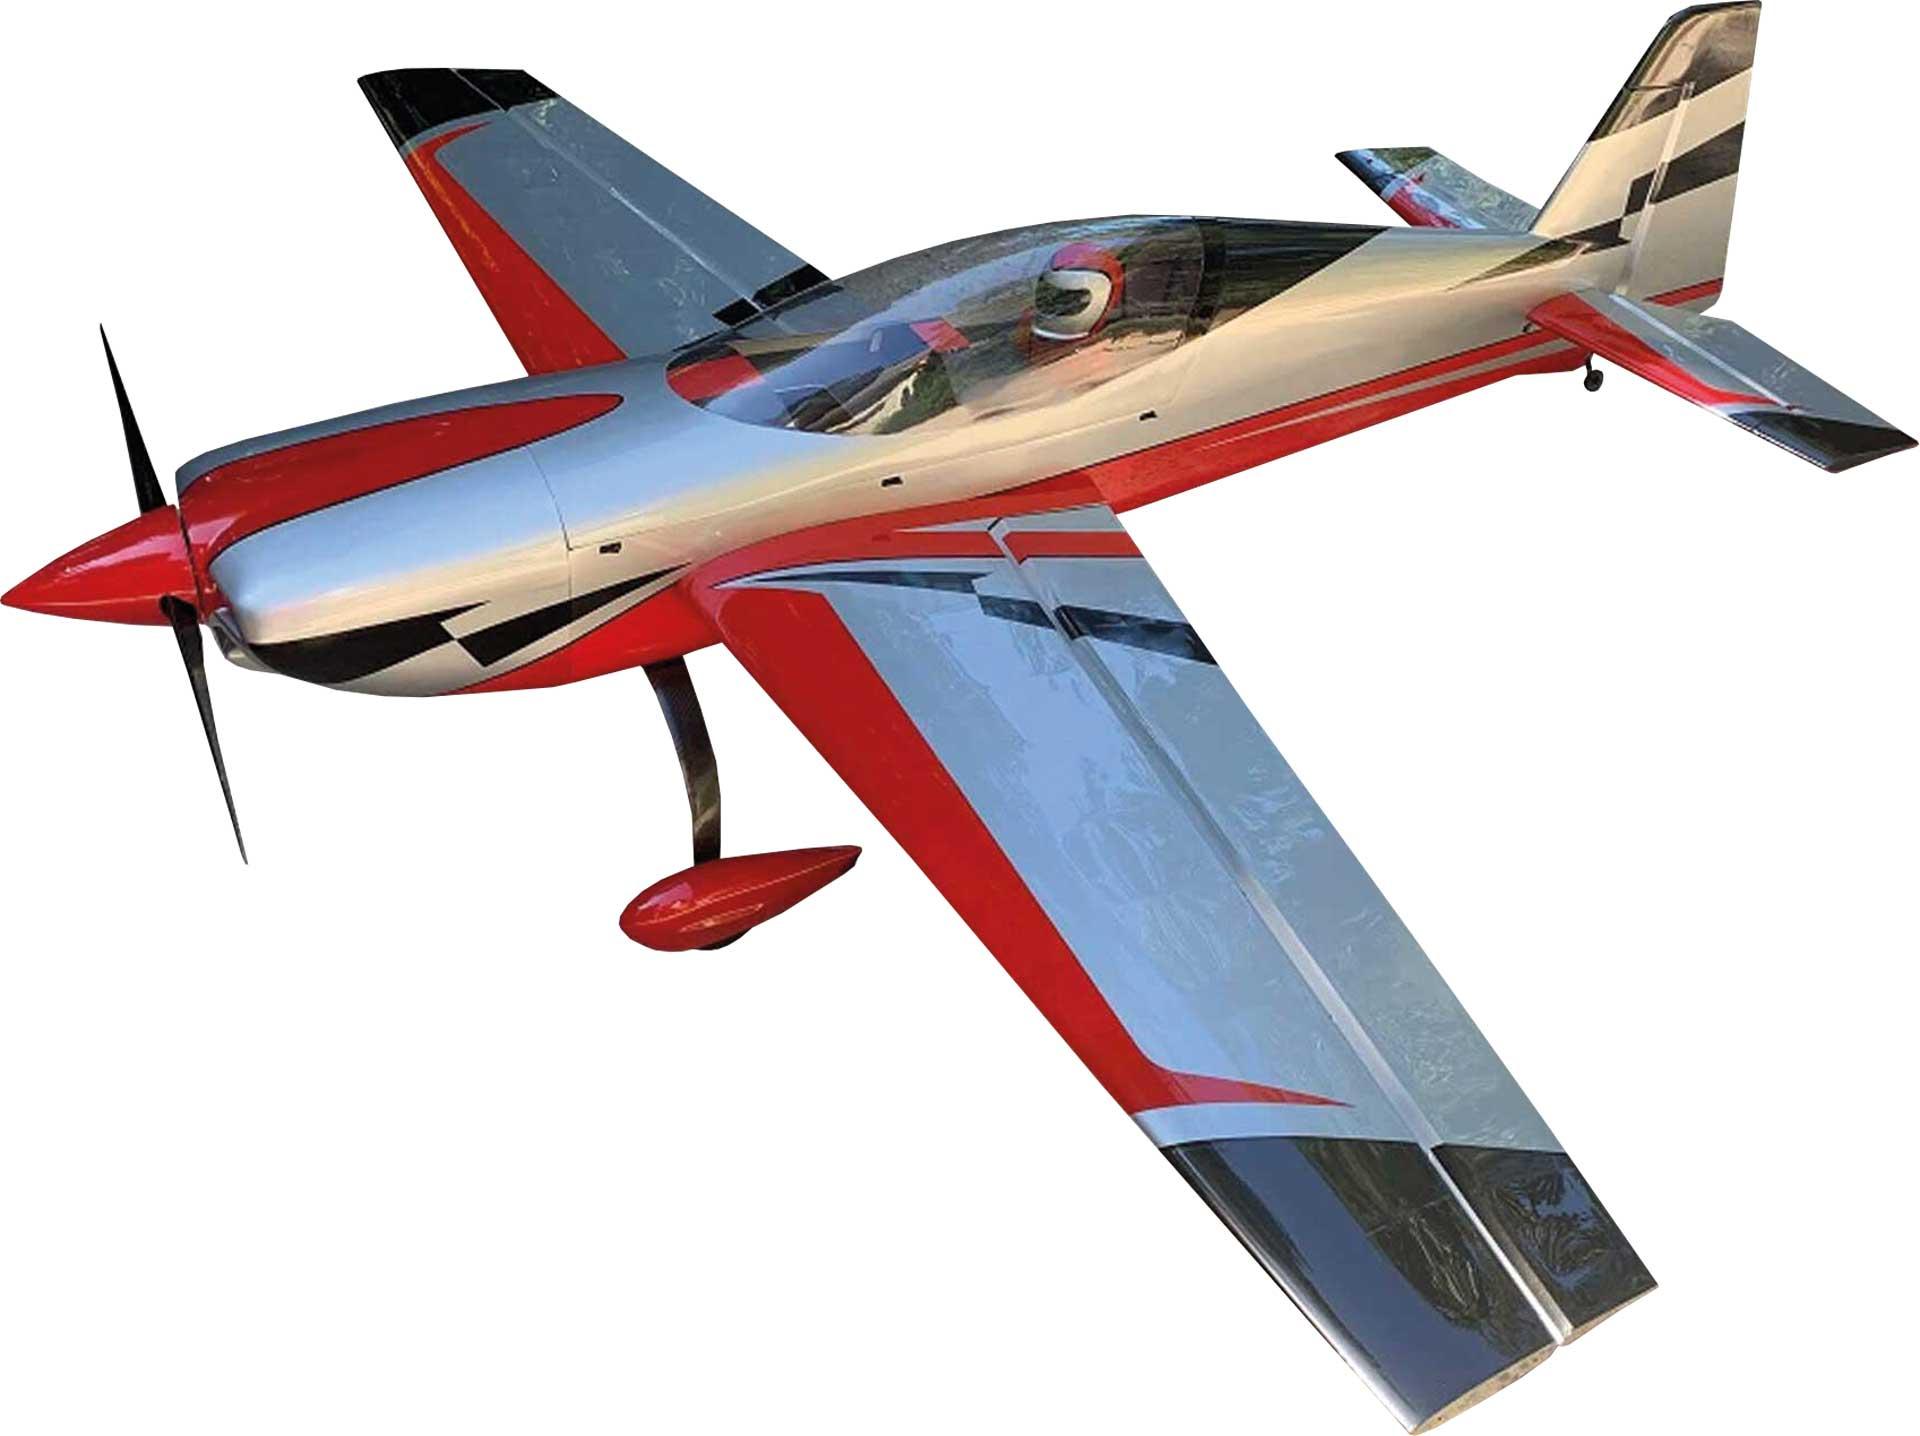 "EXTREMEFLIGHT-RC EXTRA NG 104"" Rot/Silber ARF"